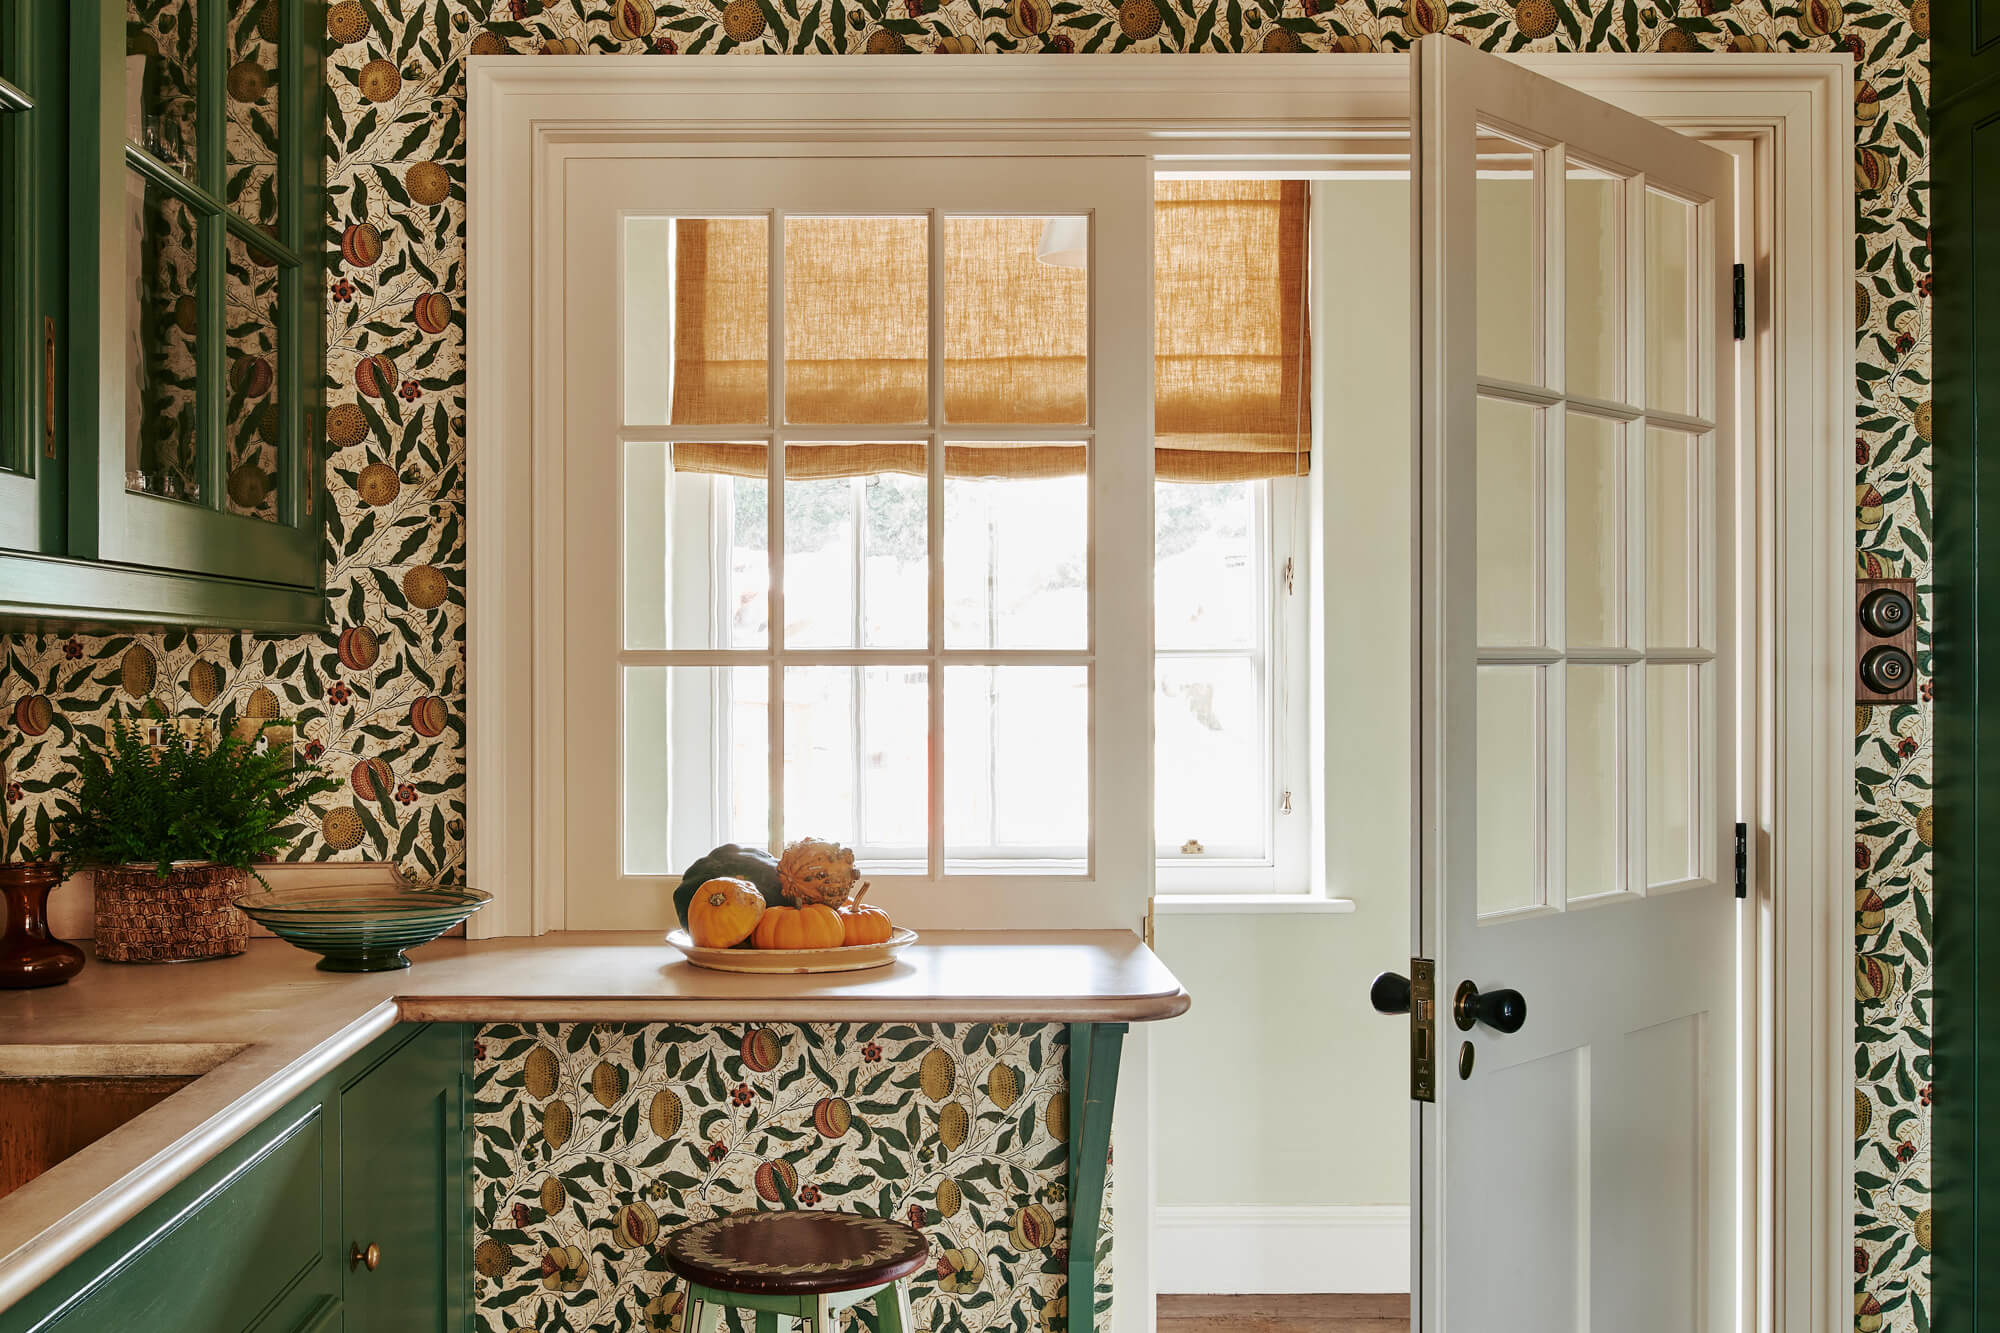 Allyson McDermott wallpaper in kitchen